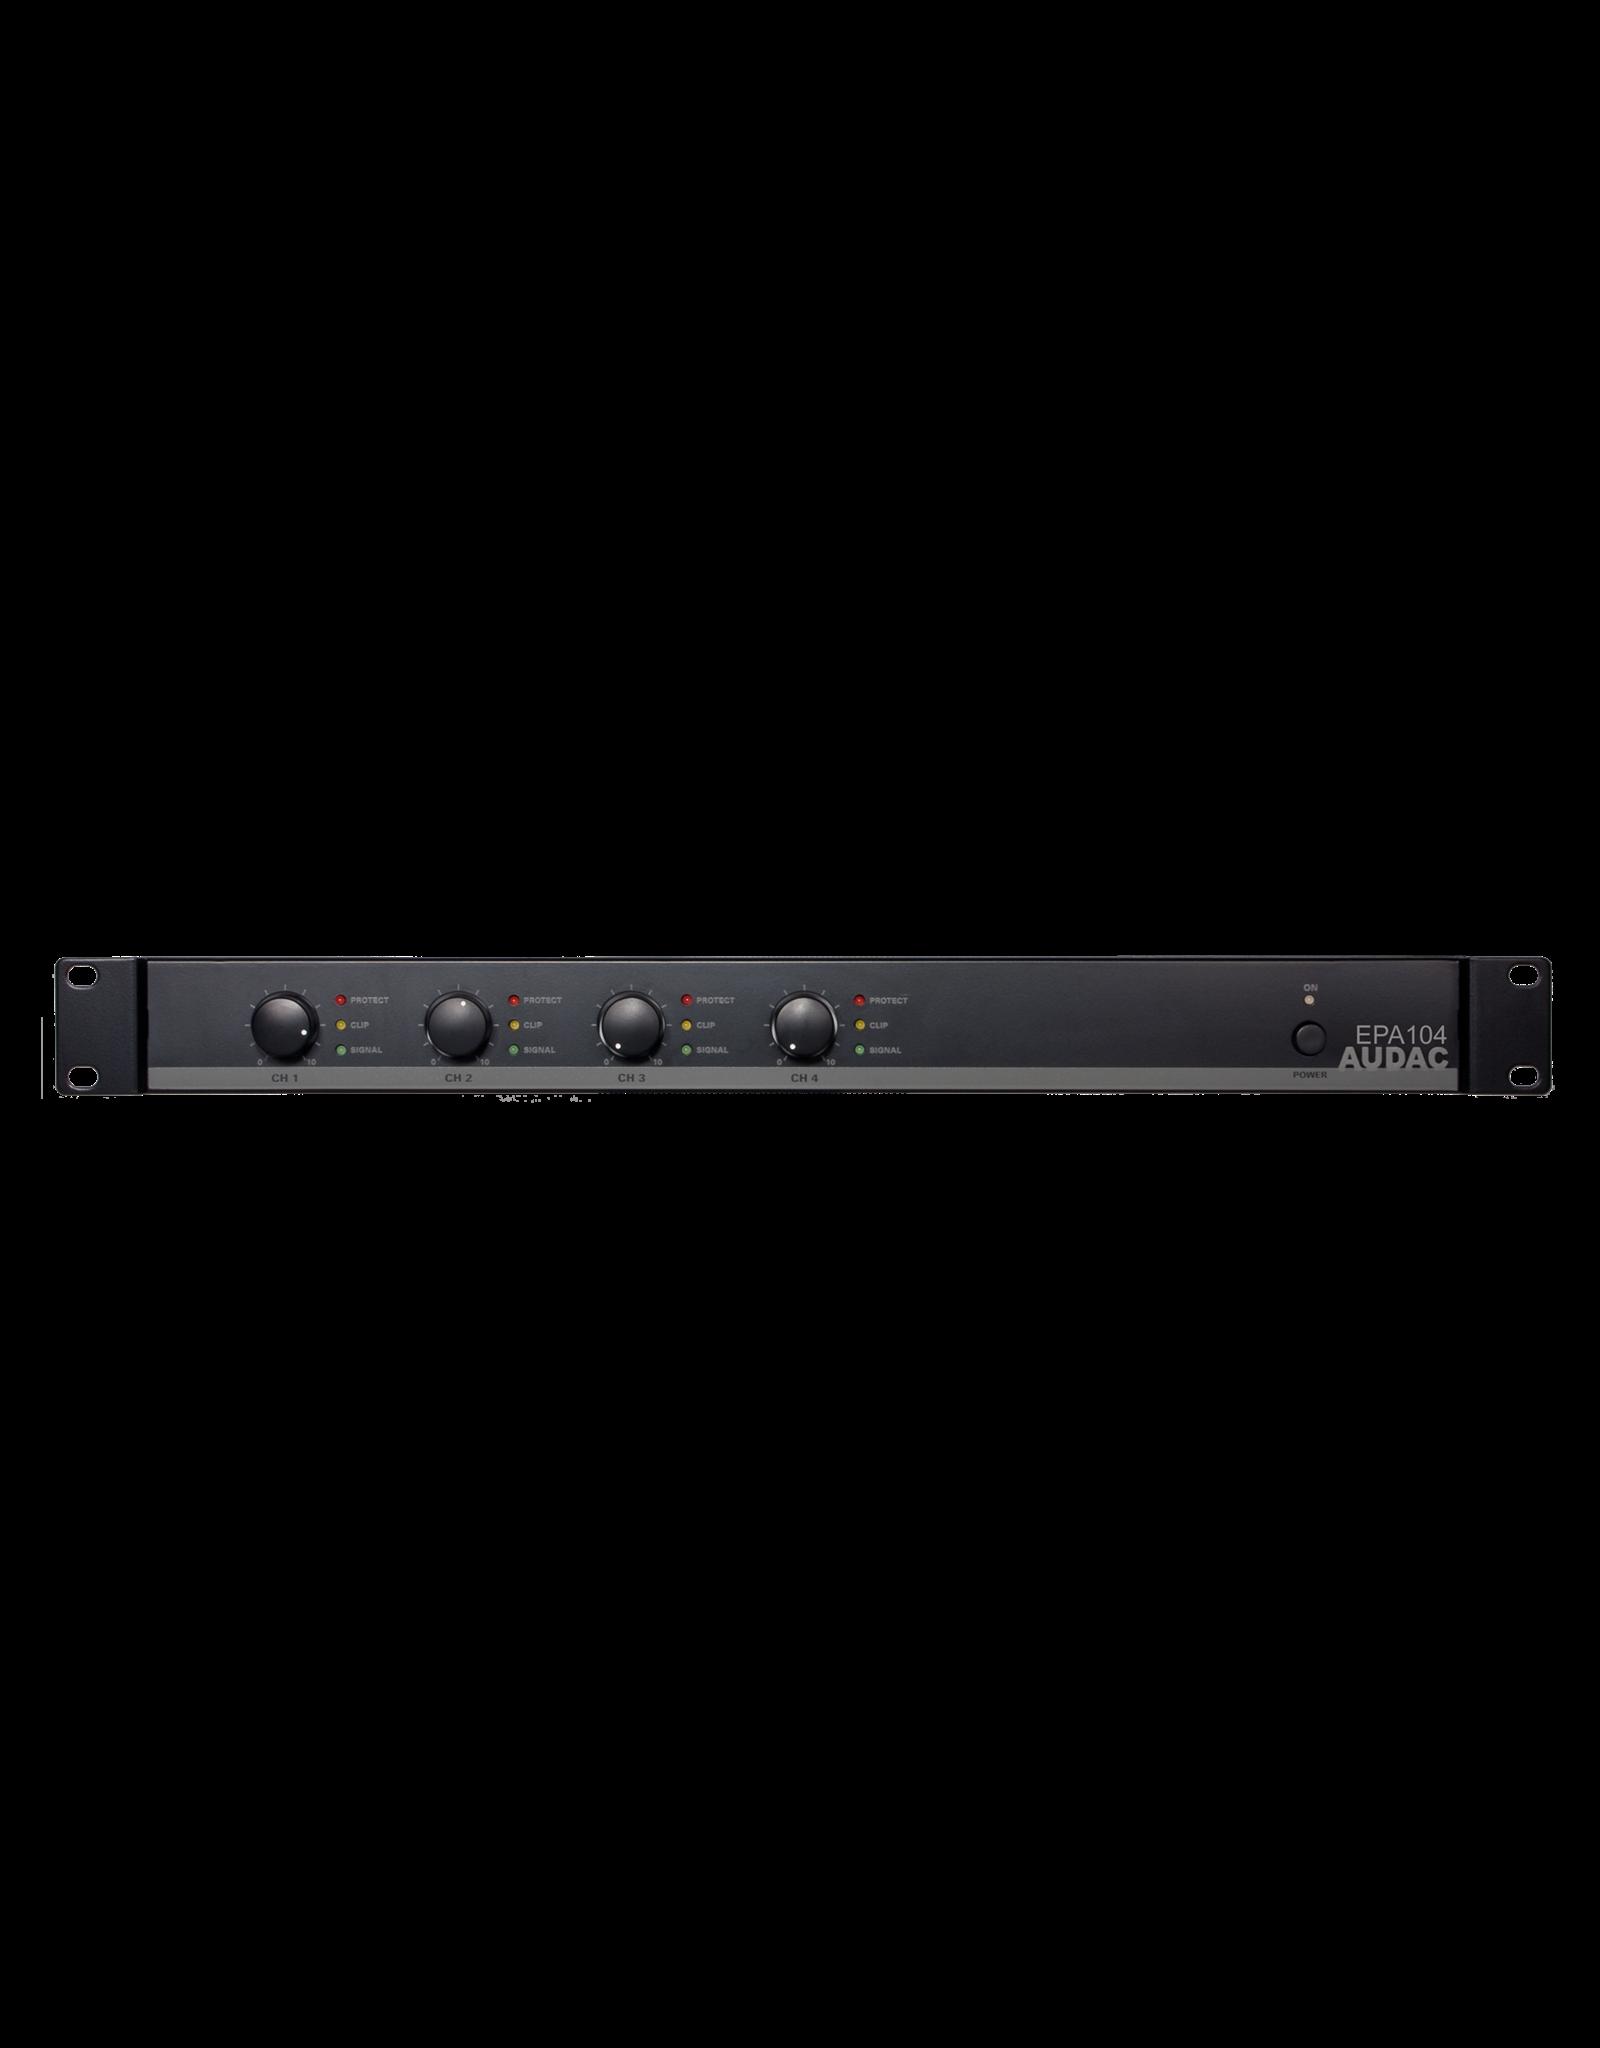 Audac Quad-channel Class-D amplifier 4 x 100W - crossover